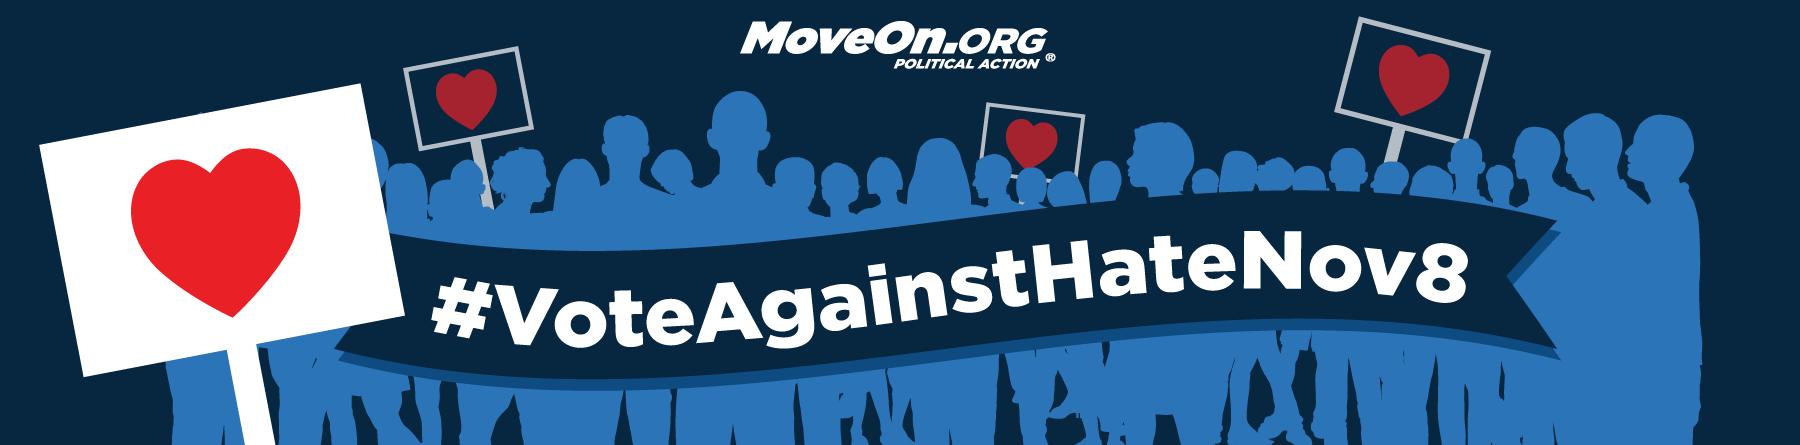 #VoteAgainstHateNov8